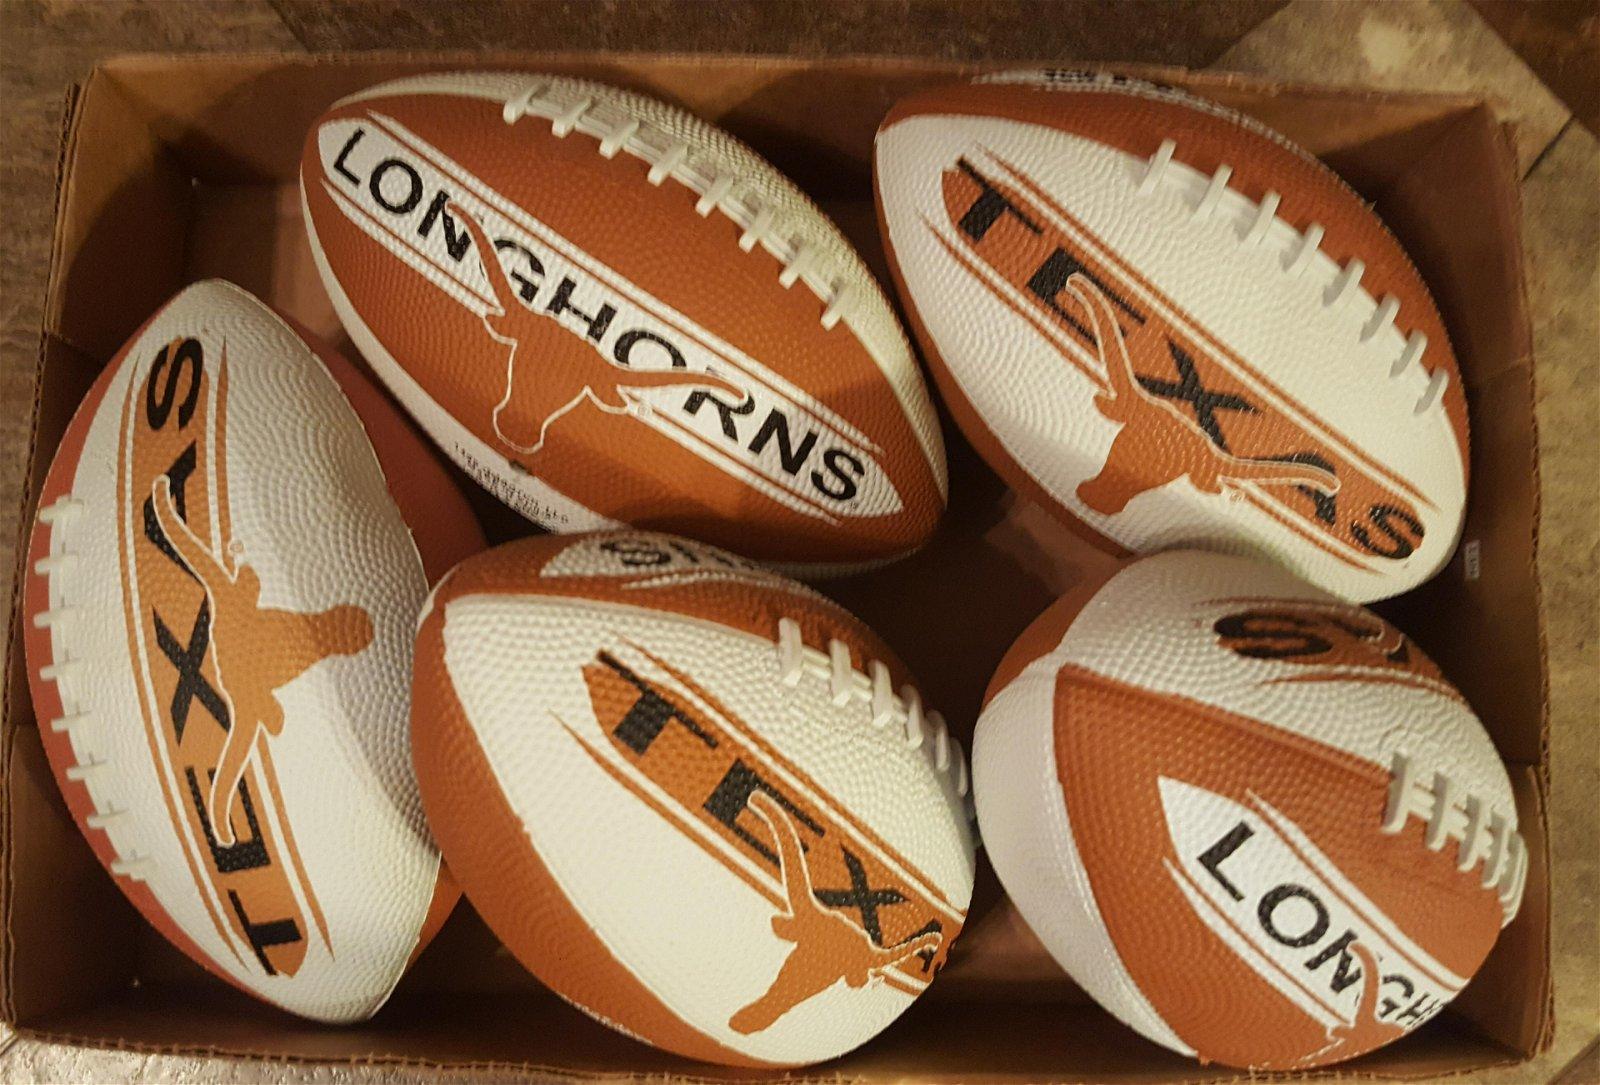 Lot of Texas Longhorns Mini Footballs